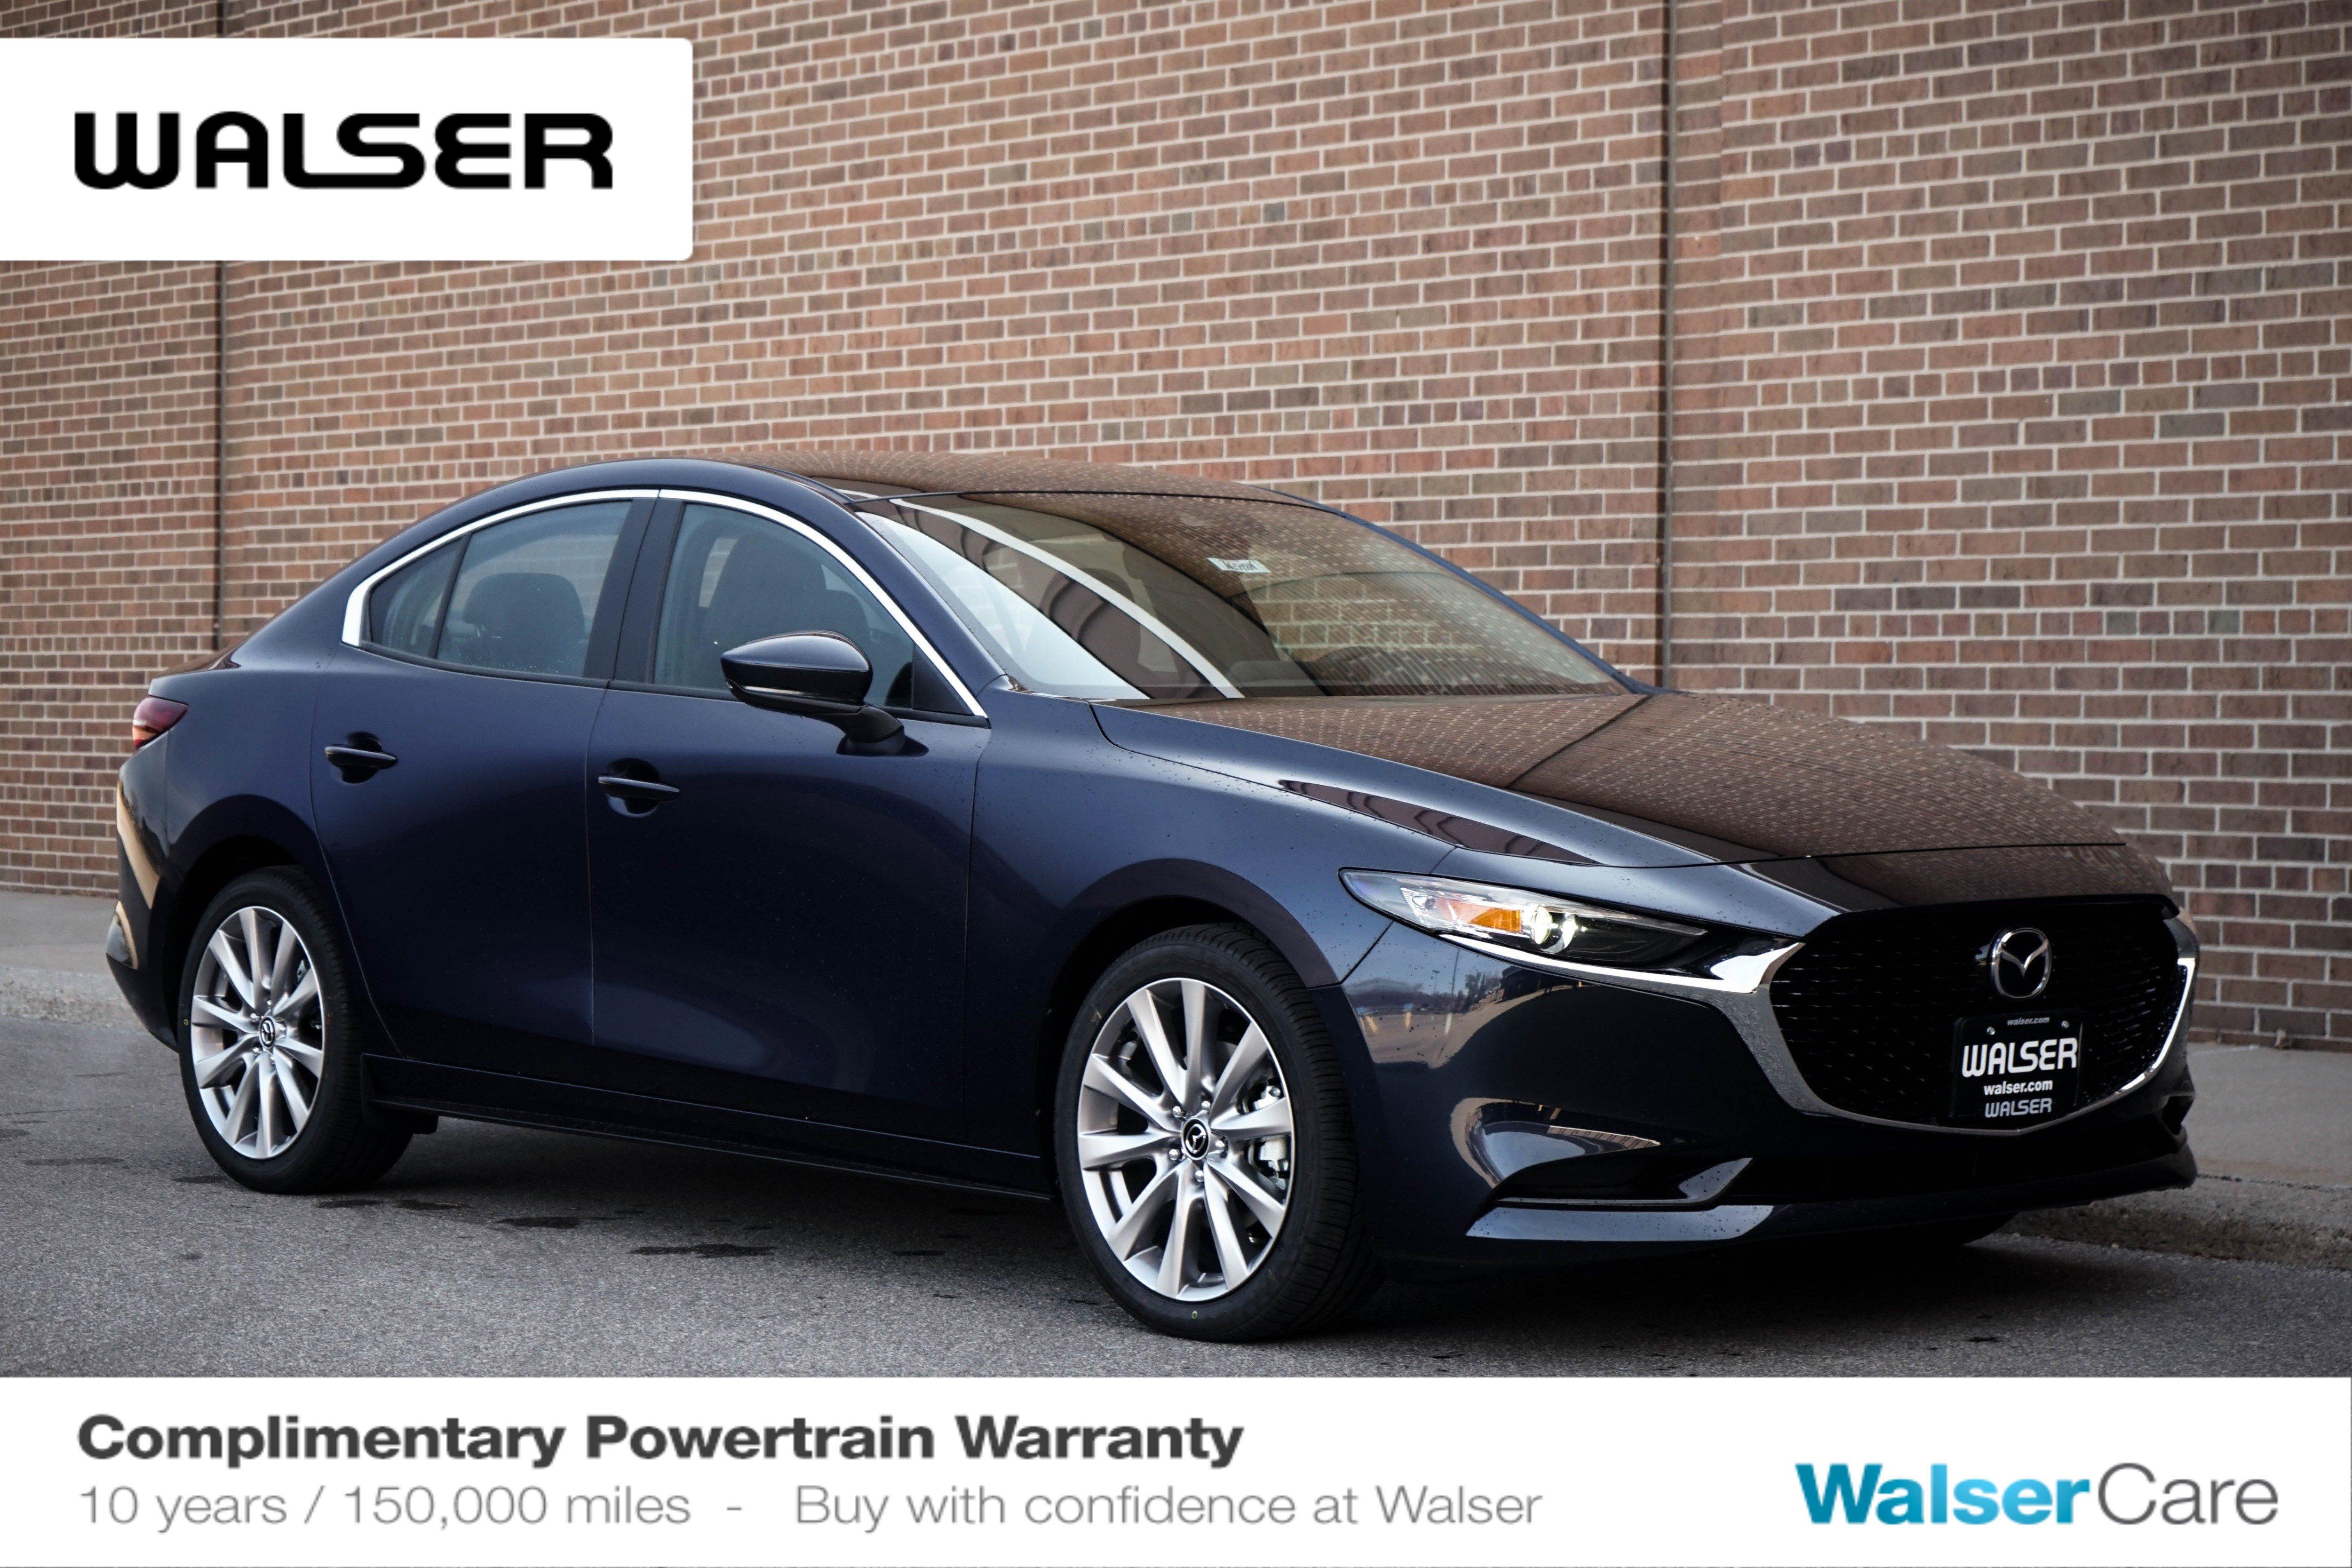 New 2020 Mazda3 Sedan SEDAN AWD PREFER